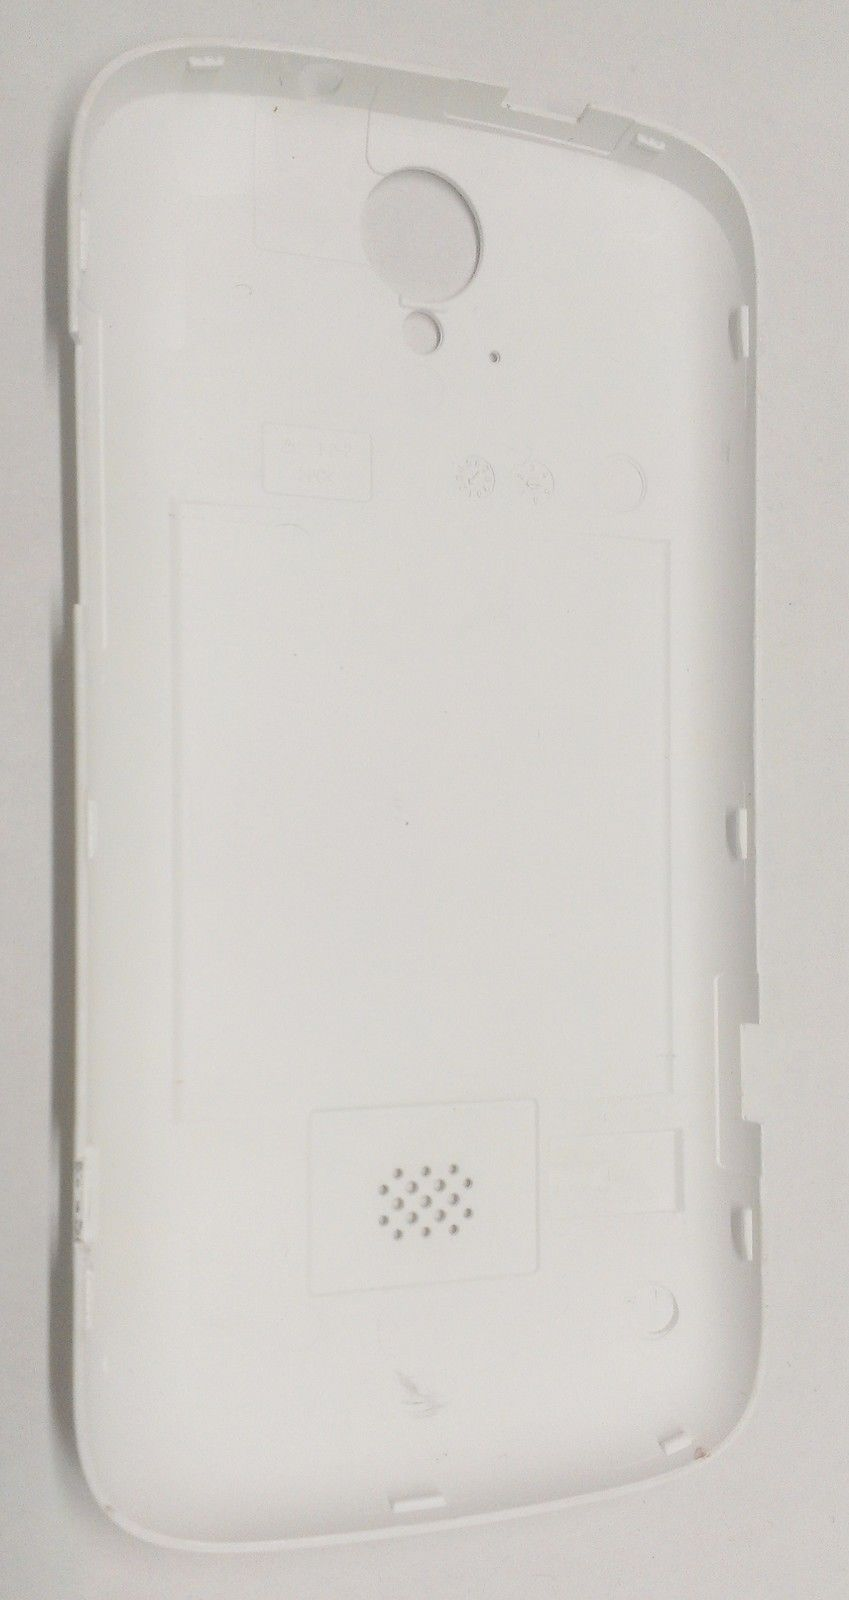 OEM Original Huawei myTouch Q  Back Cover Battery Door T-Mobile U8730 - White image 2